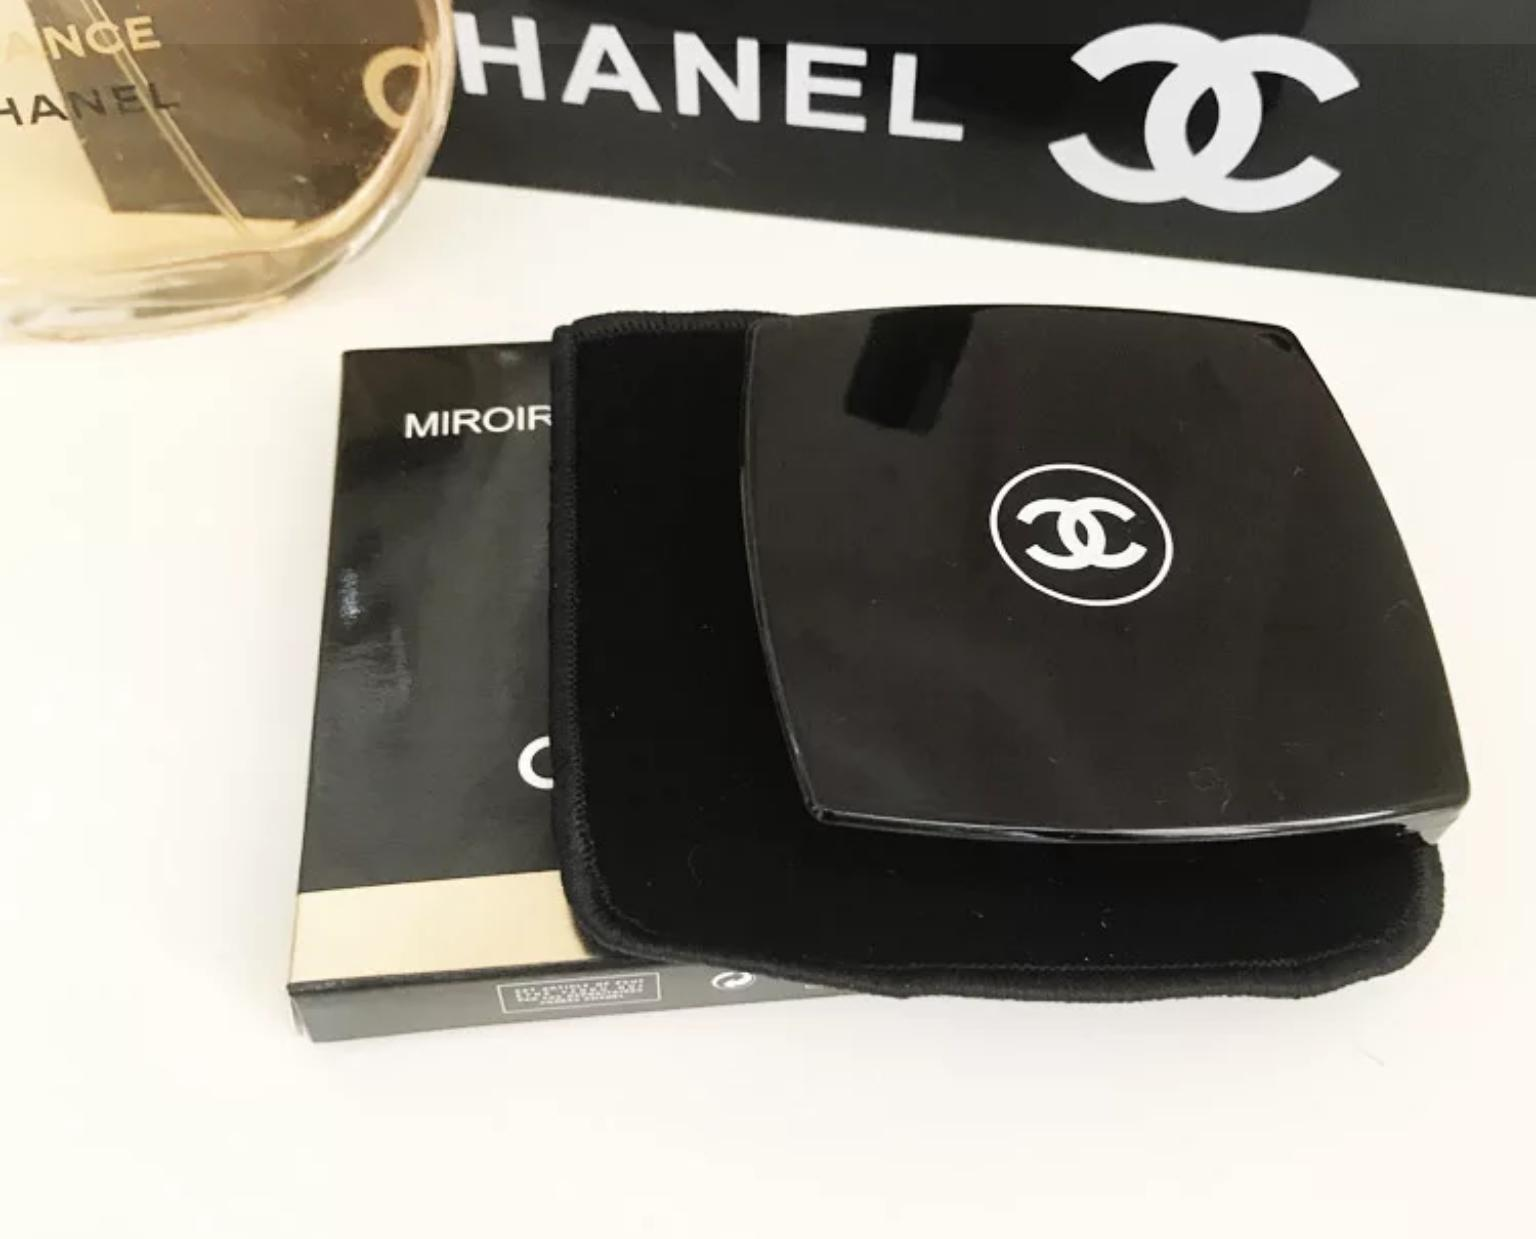 Chanel Makeup Mirror Philippines